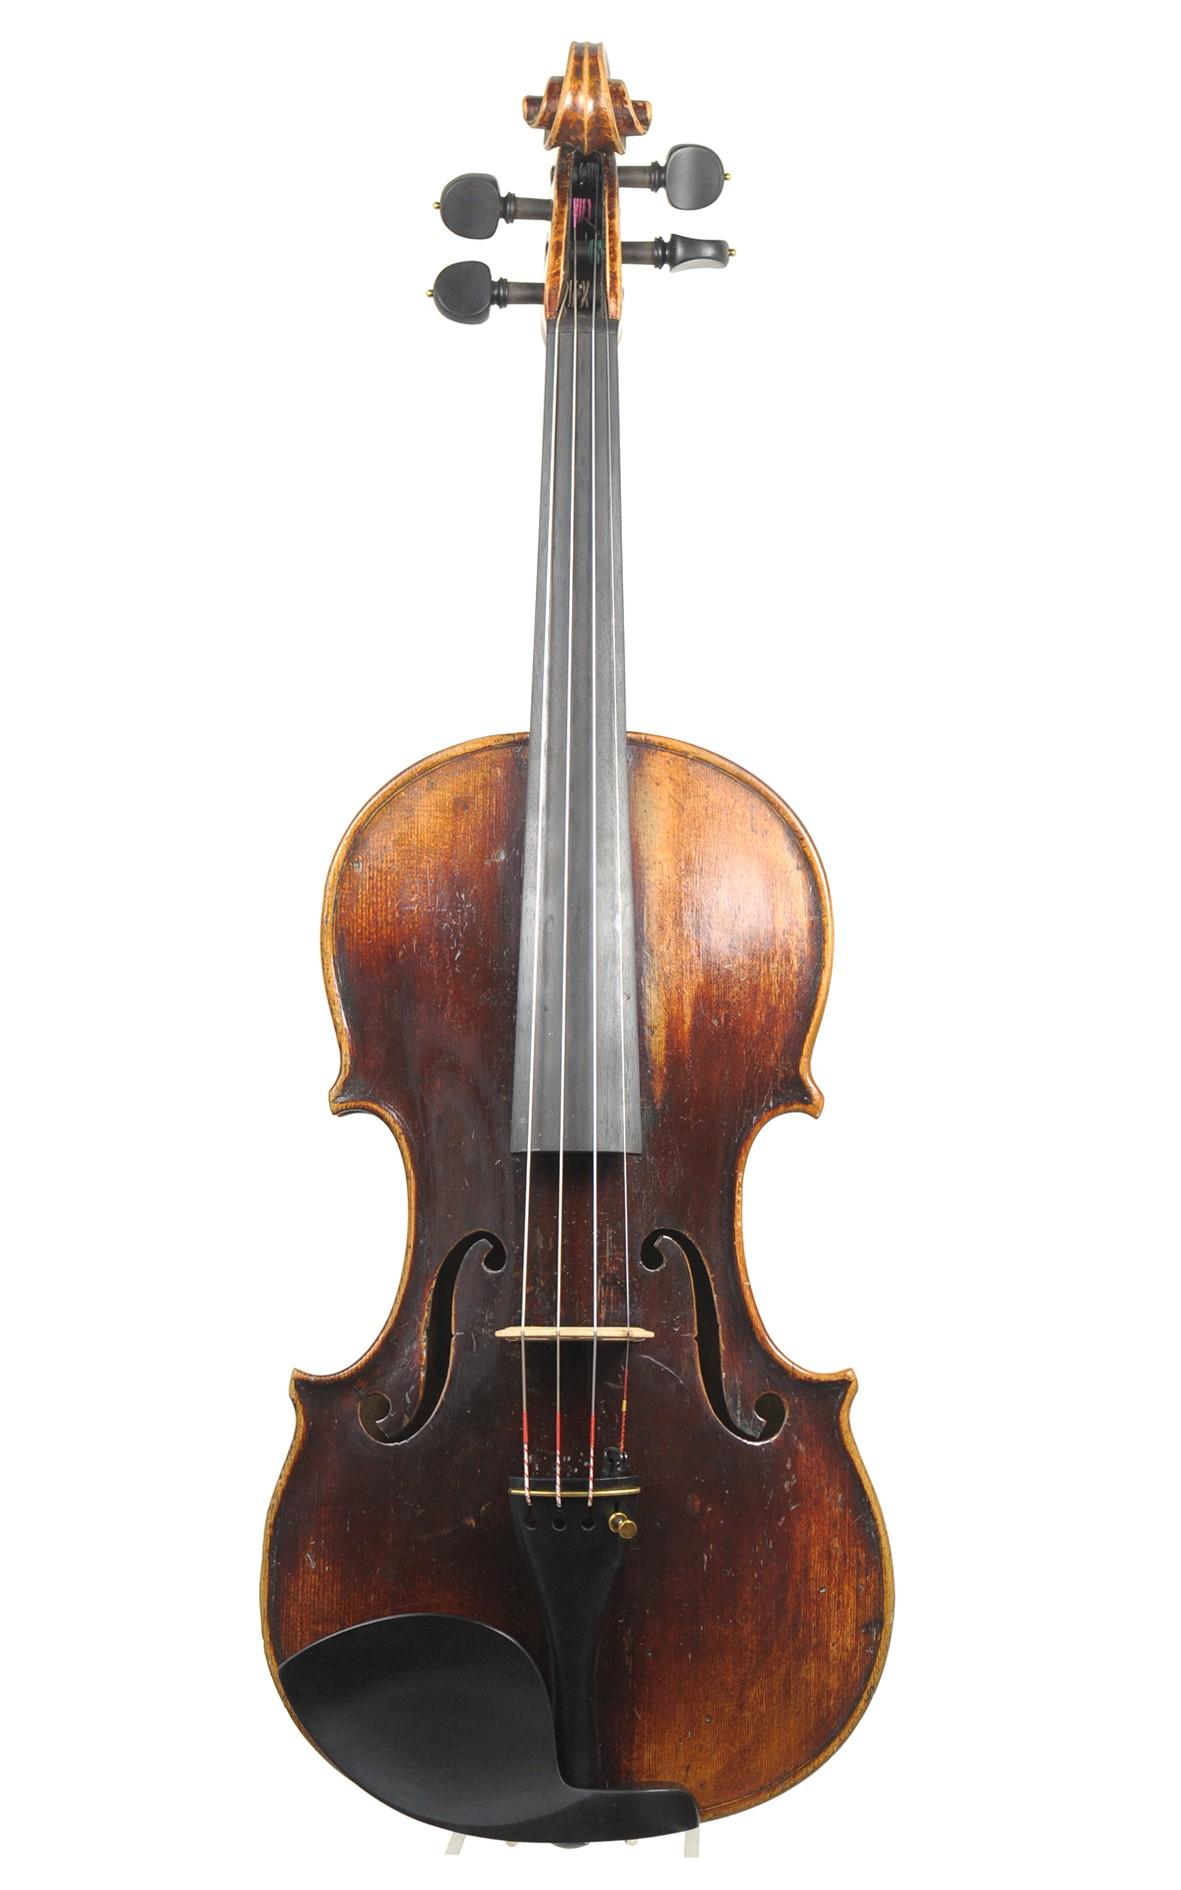 Thomas Simon: Mittenwald violin, c.1850 - top